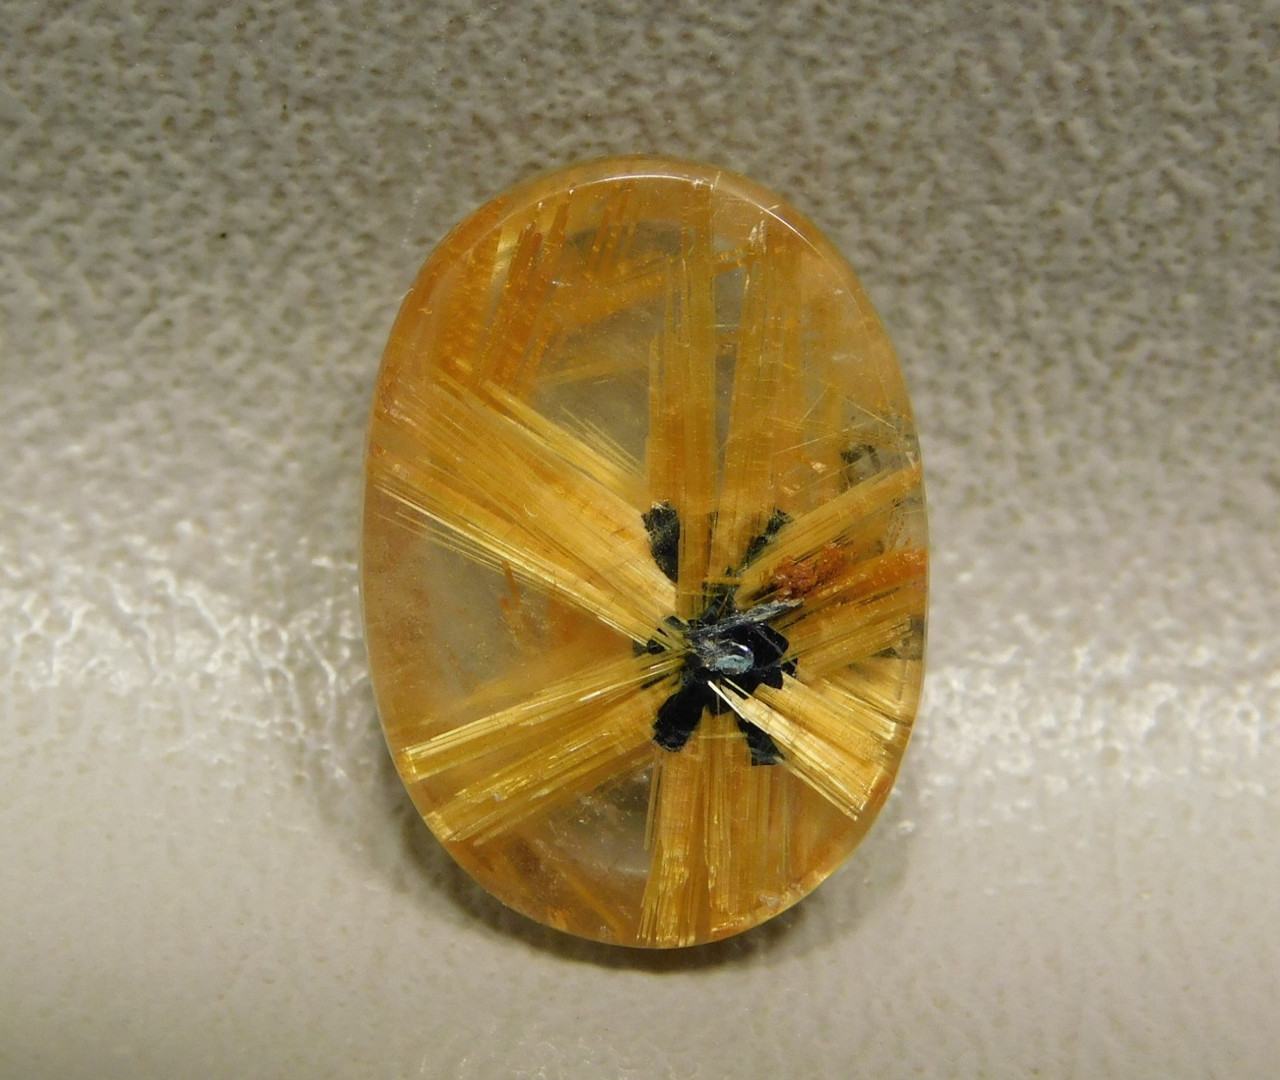 Star Rutile Quartz Rutilated Gemstone Cabochon #SRQ2